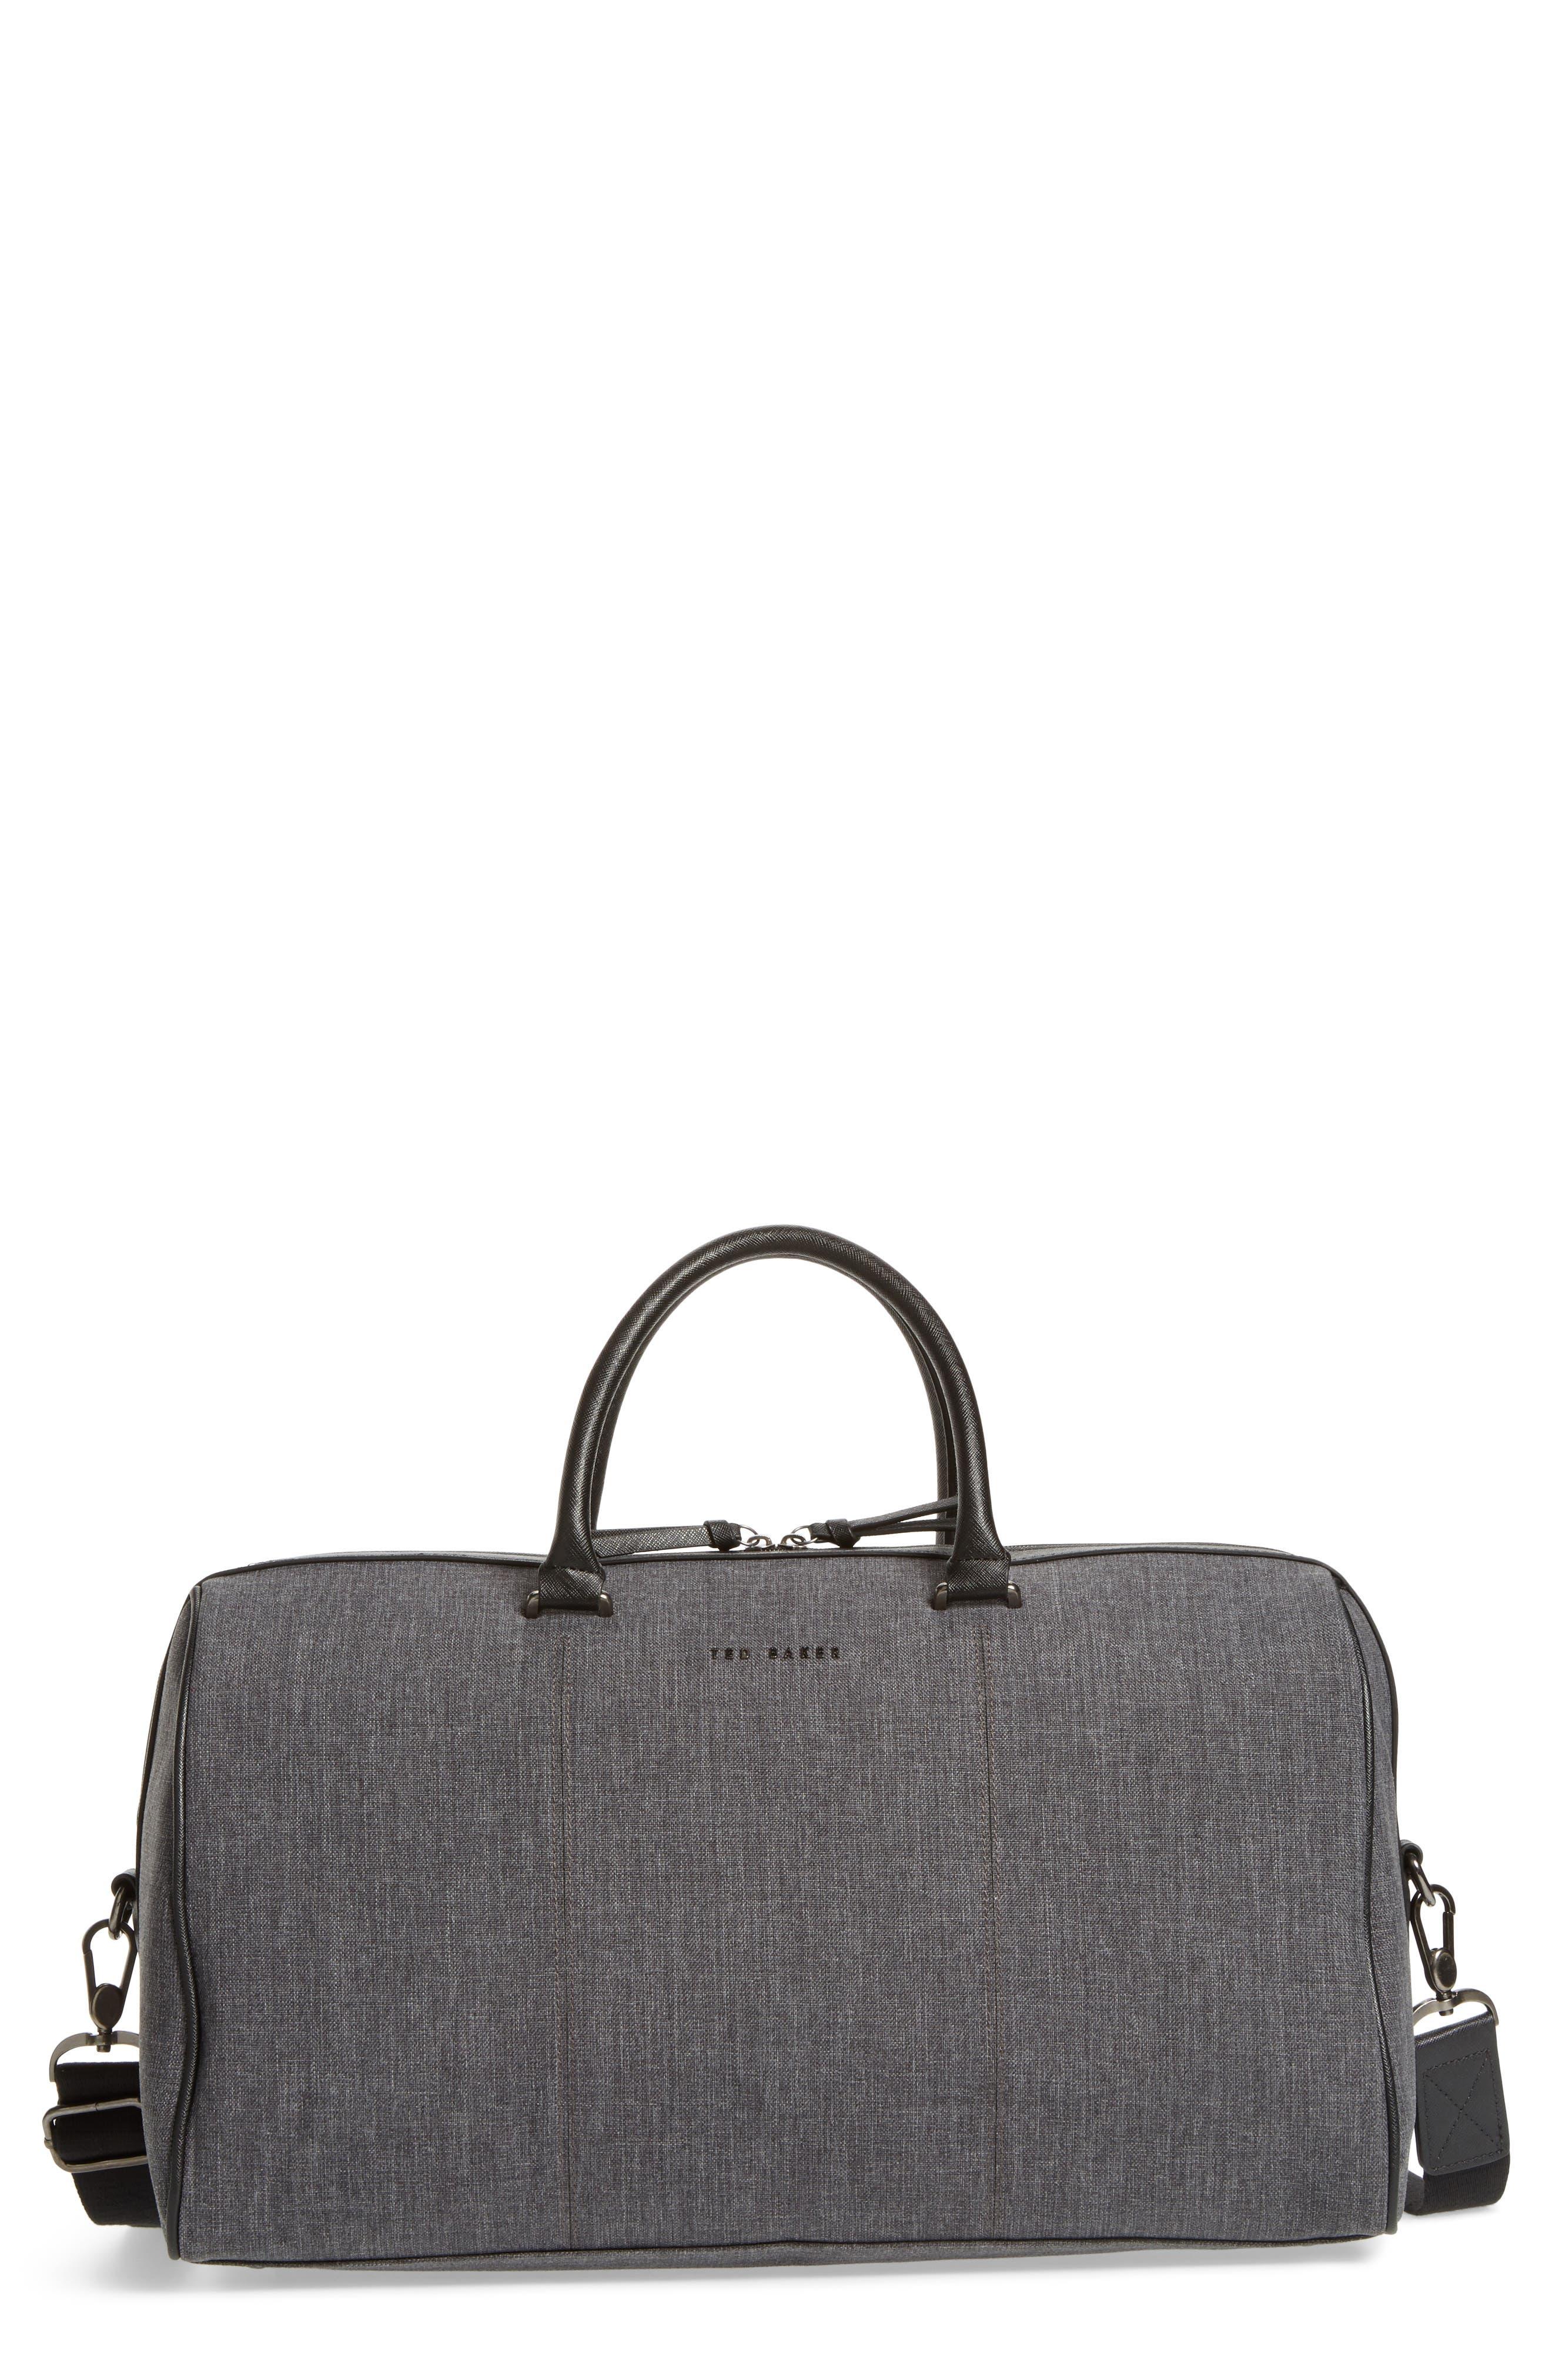 TED BAKER LONDON Caper Duffle Bag, Main, color, CHARCOAL